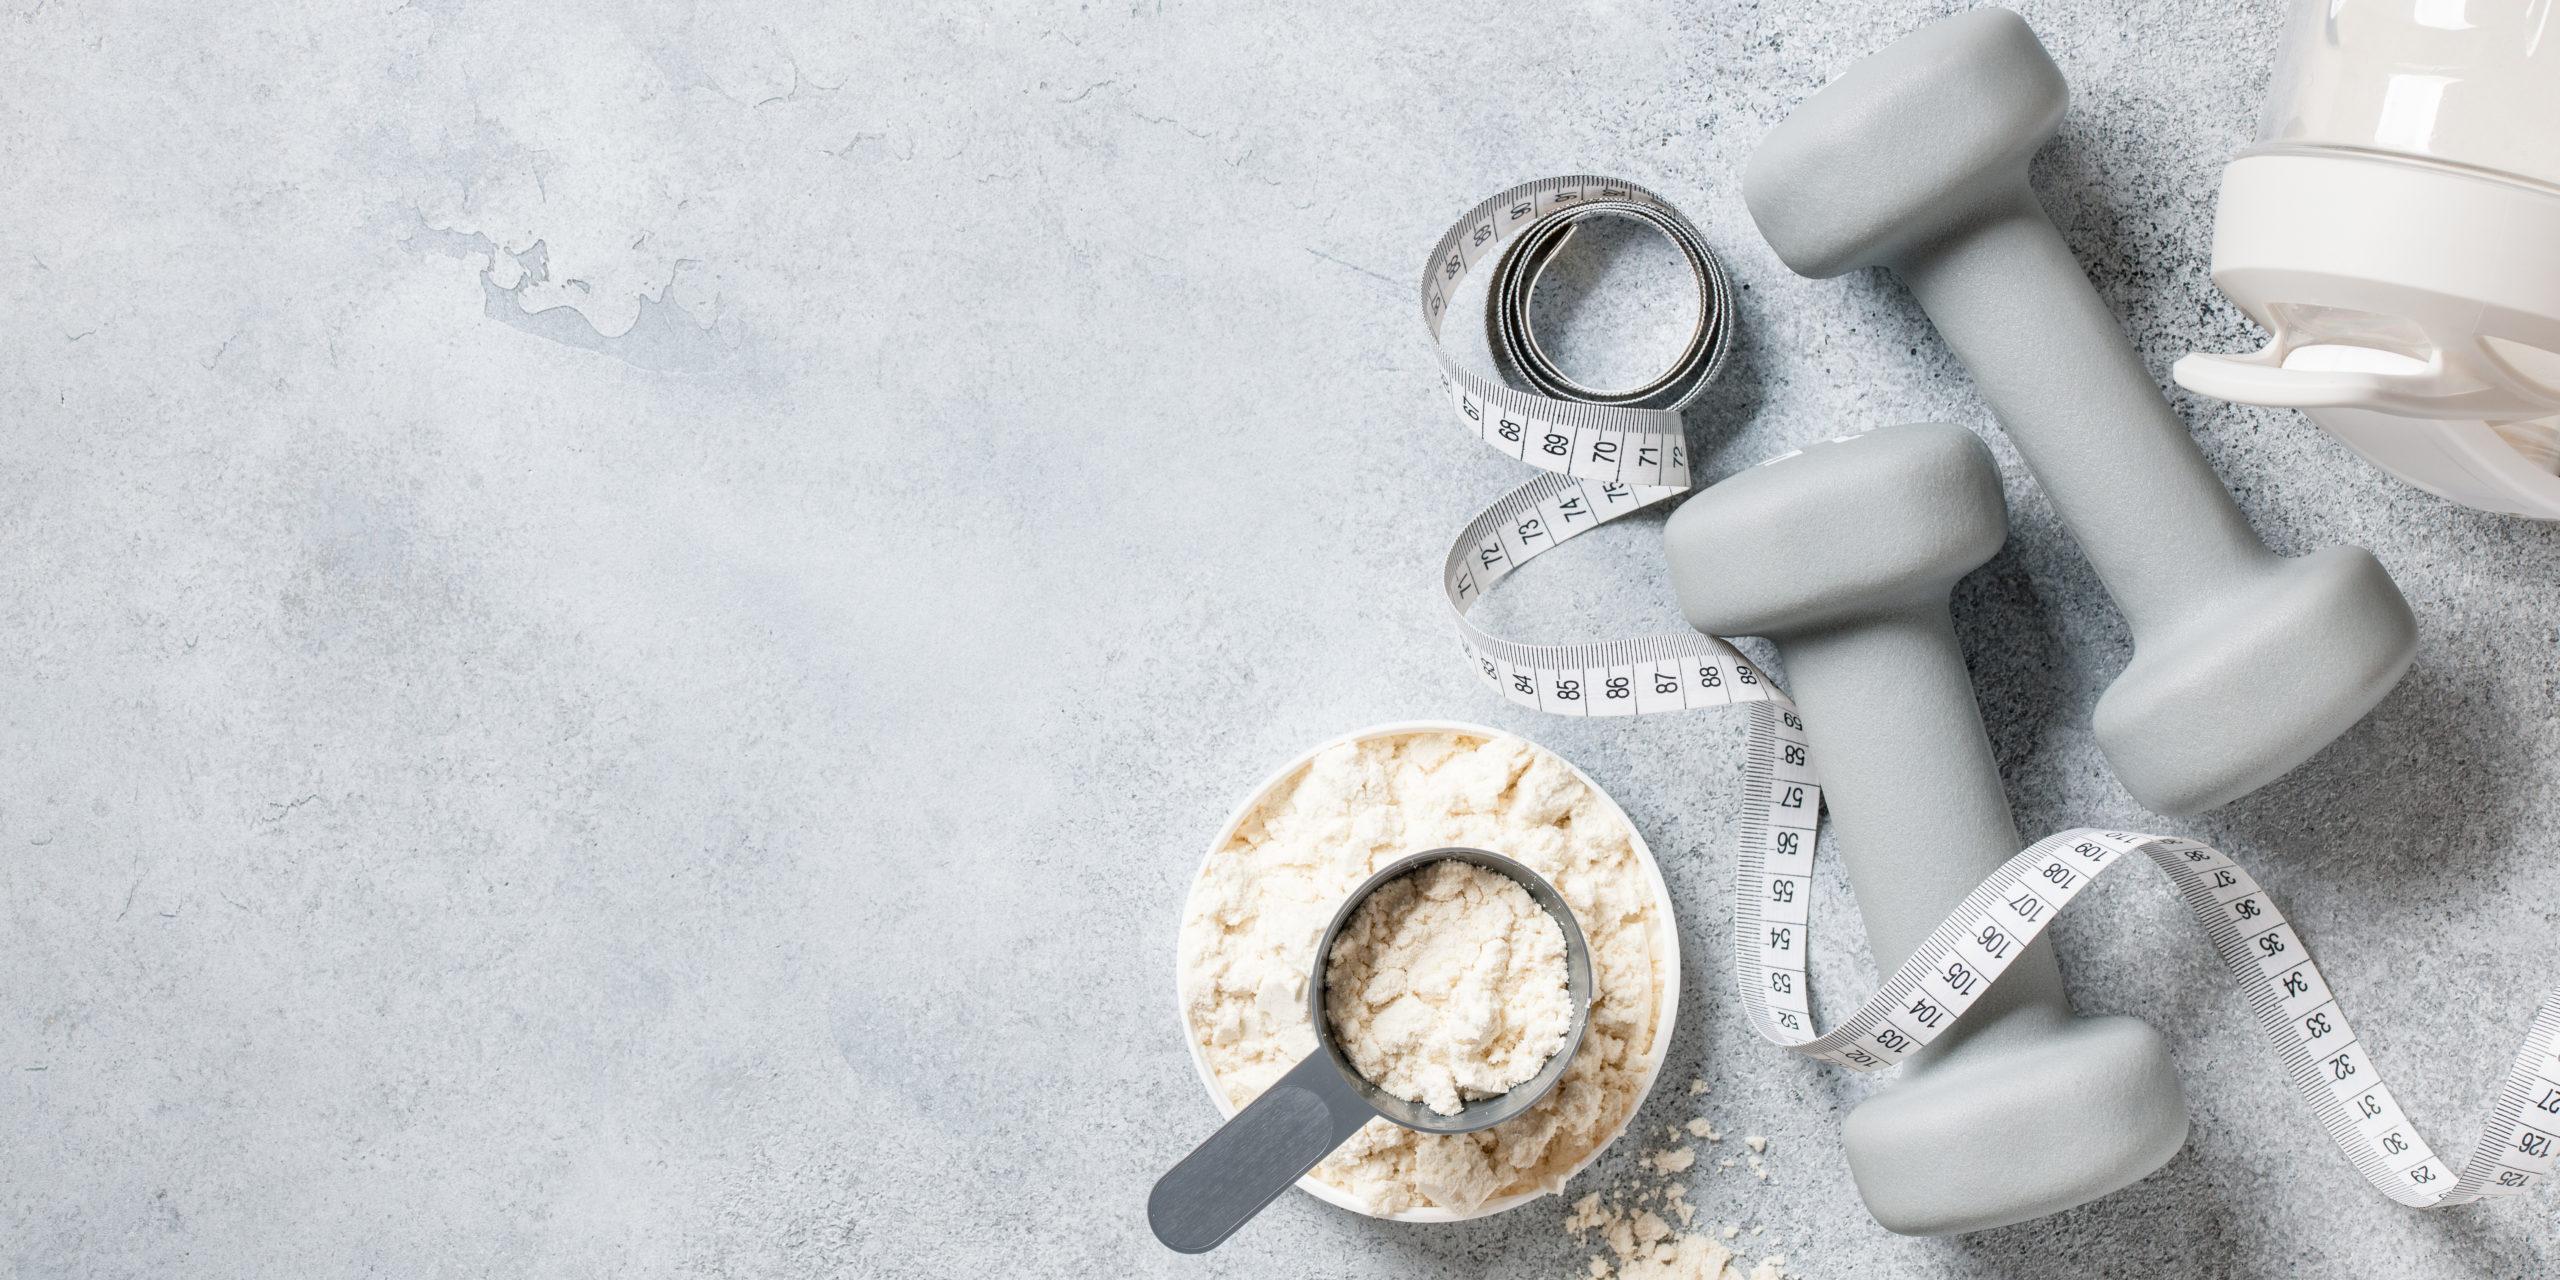 Proteína: consumir antes ou depois do treino?